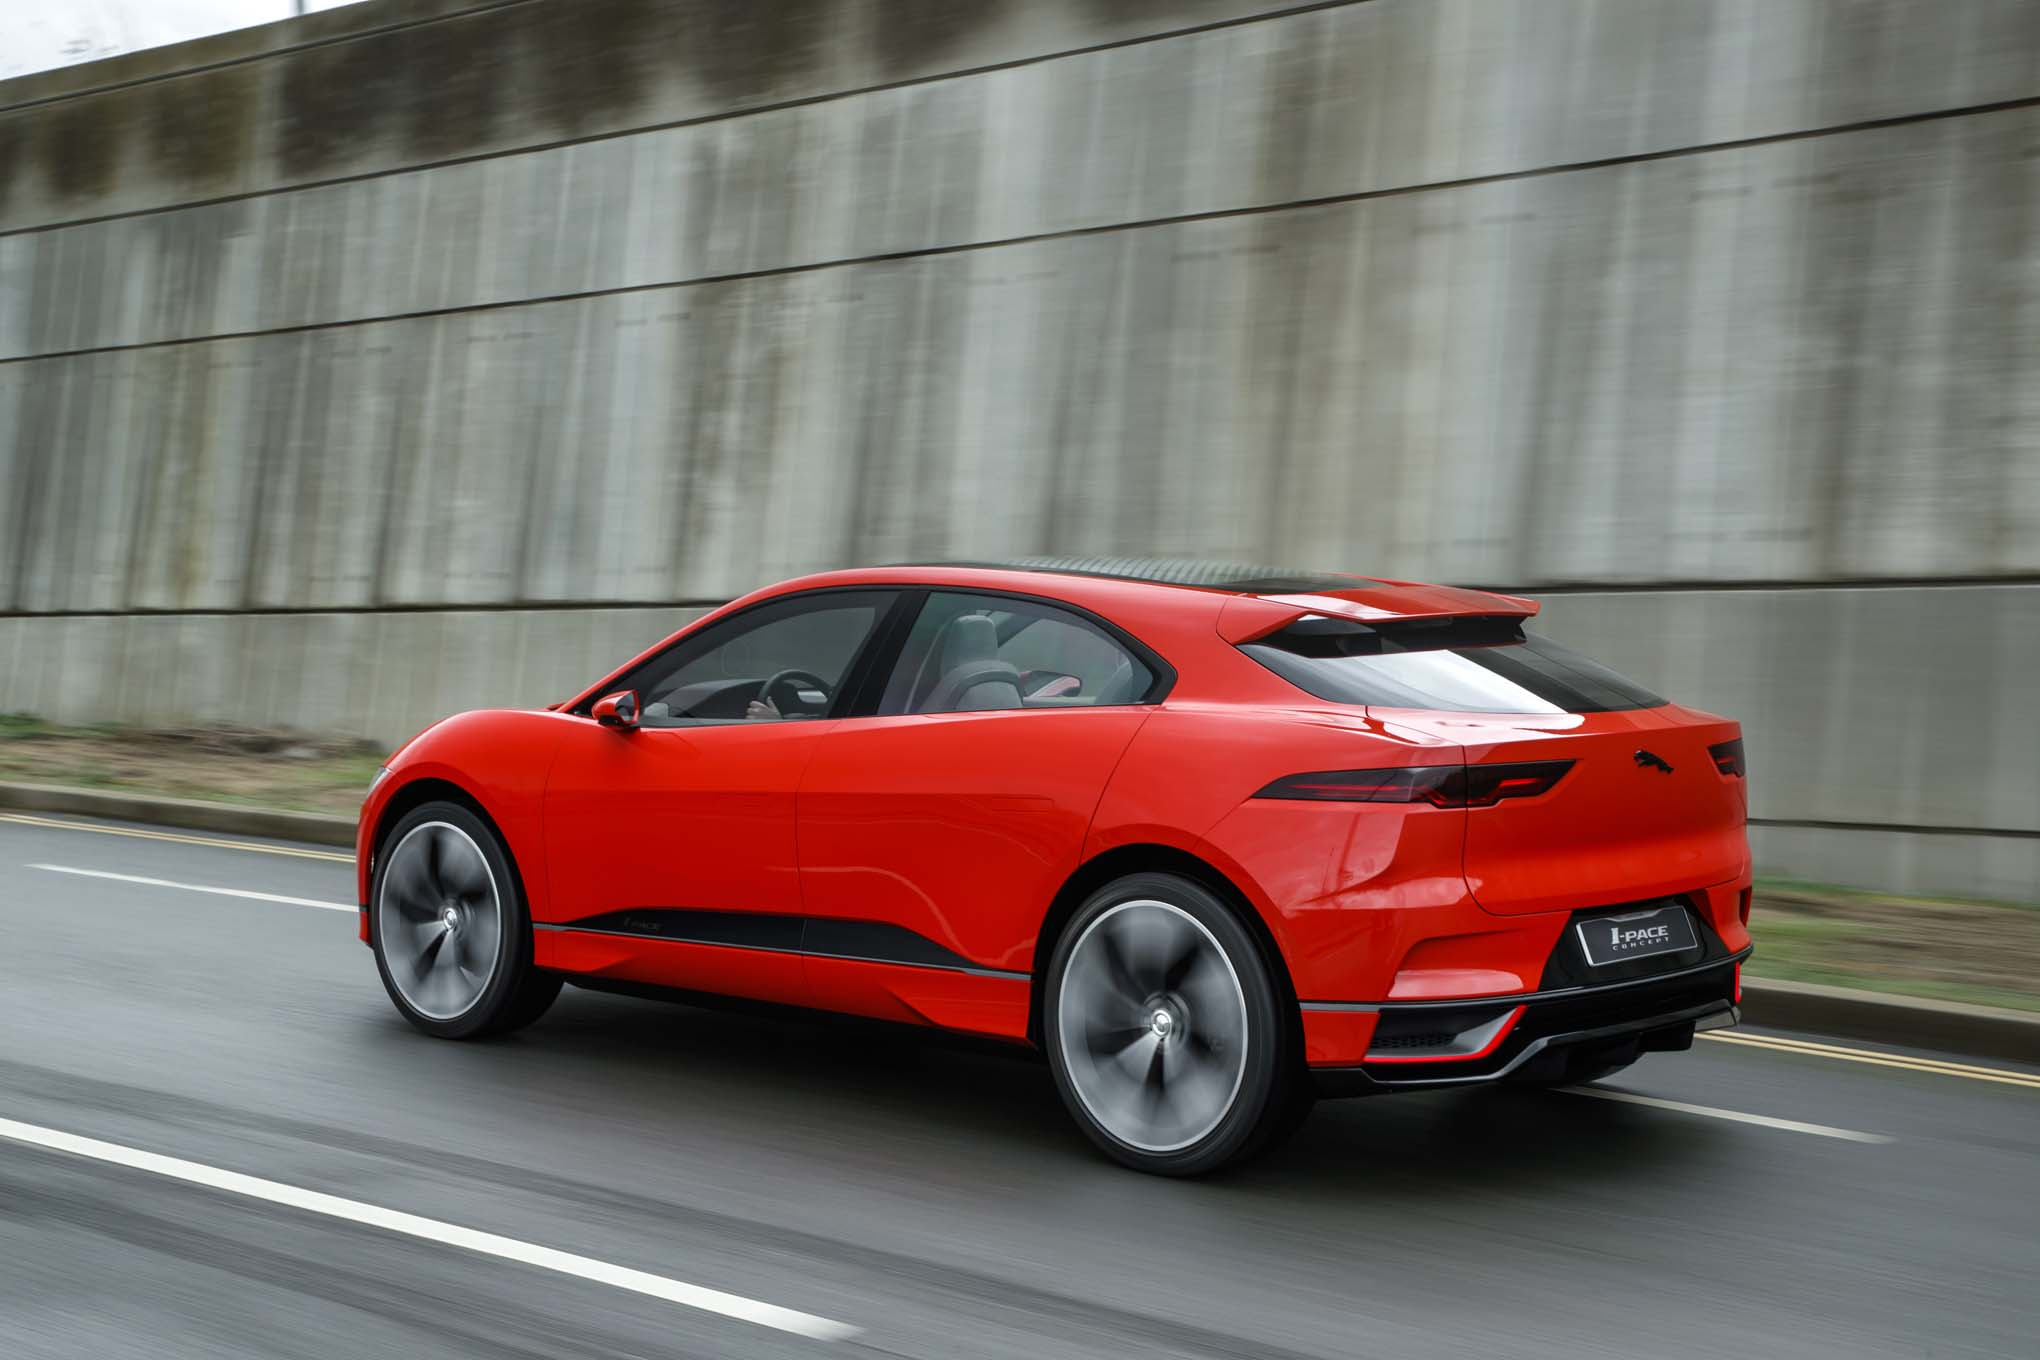 jaguar teases new e pace compact suv automobile magazine. Black Bedroom Furniture Sets. Home Design Ideas